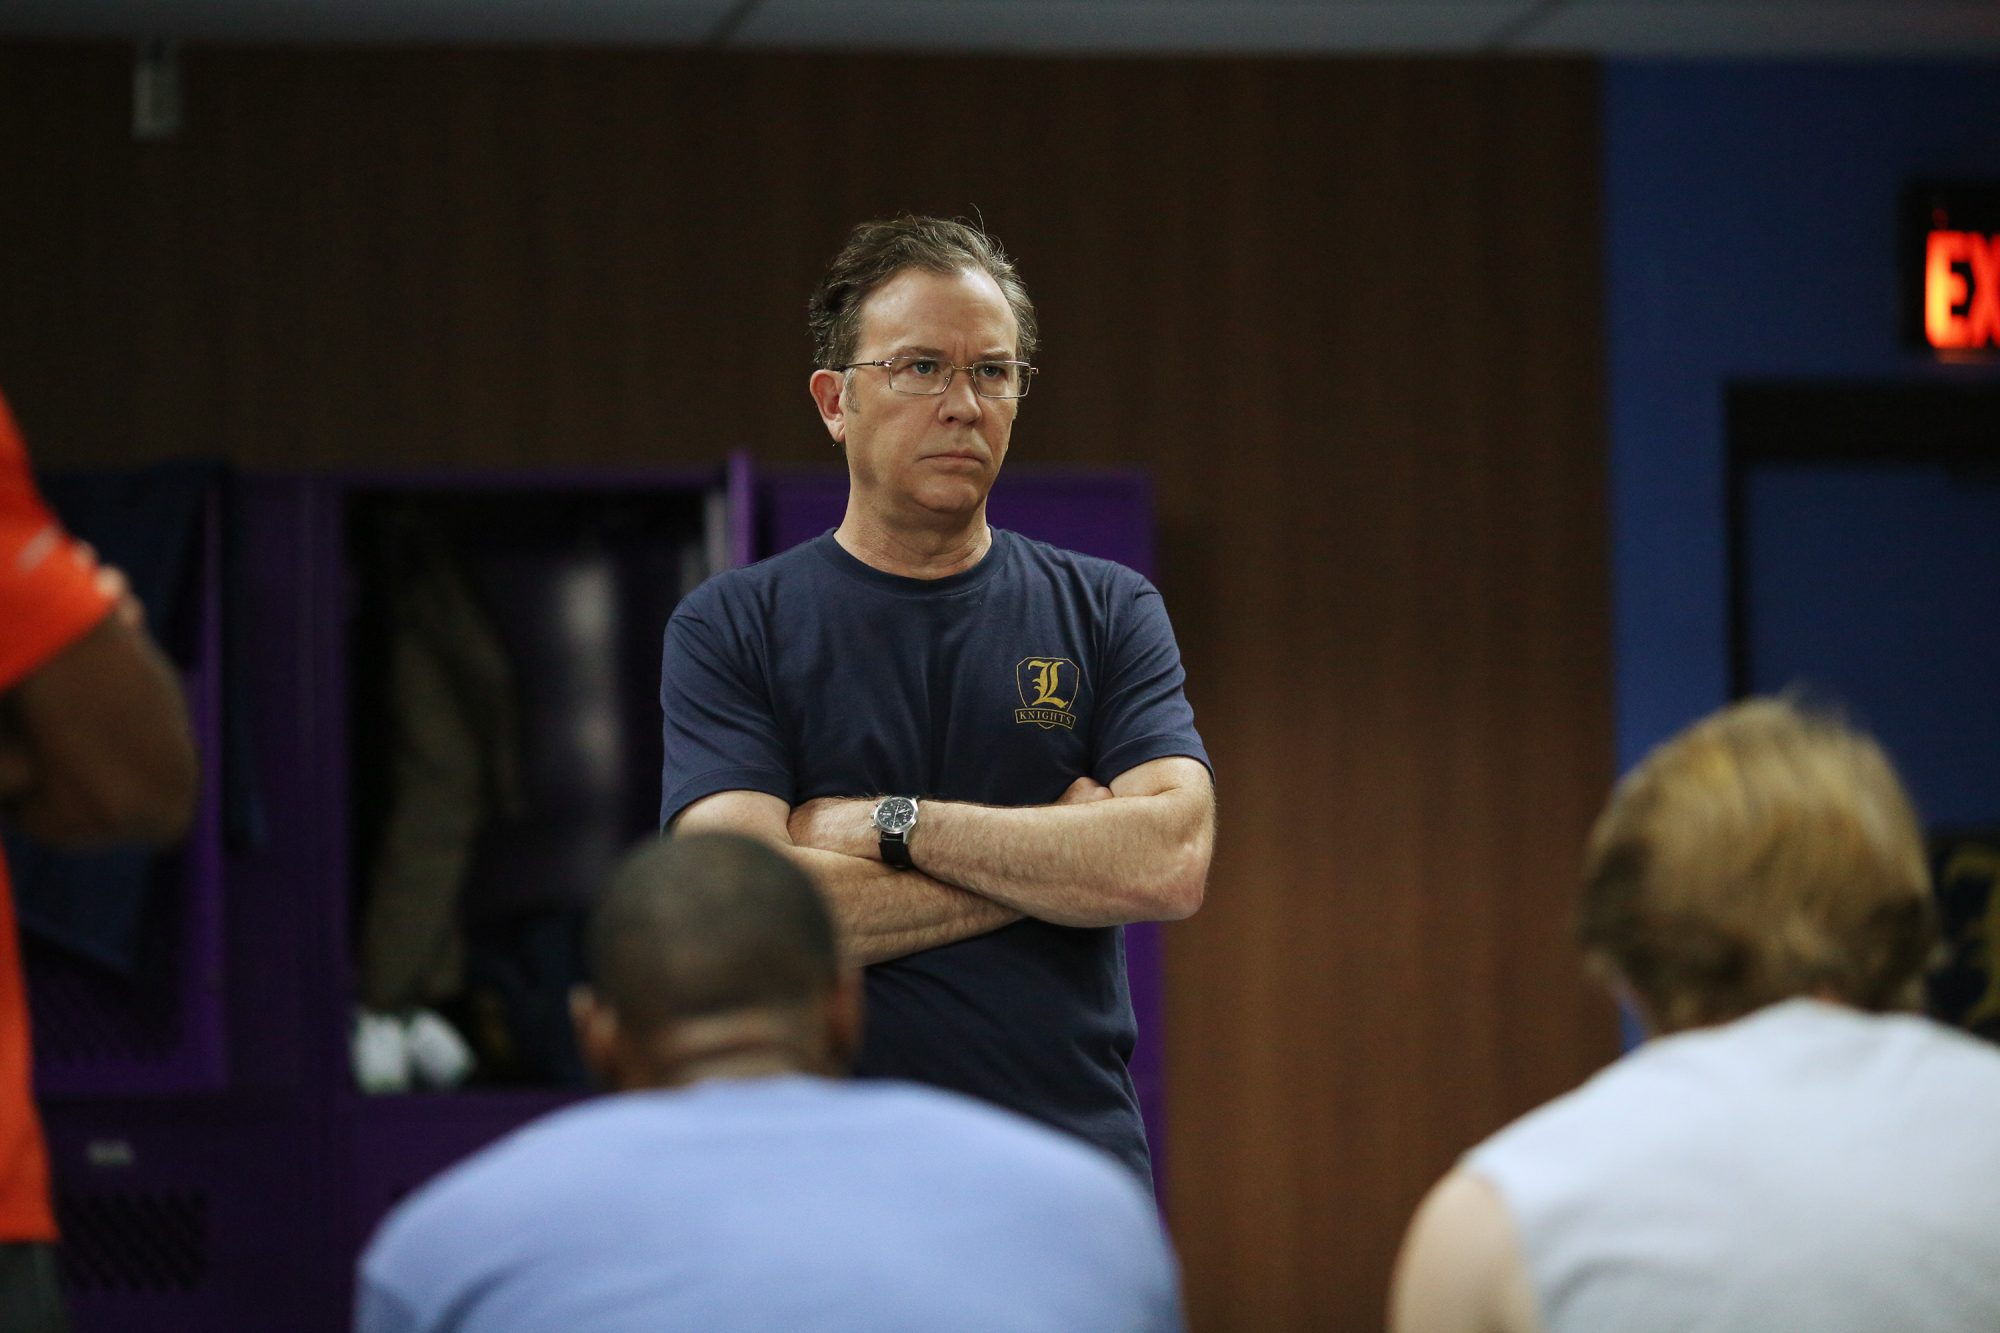 Timothy Hutton stars as Coach Dan Sullivan